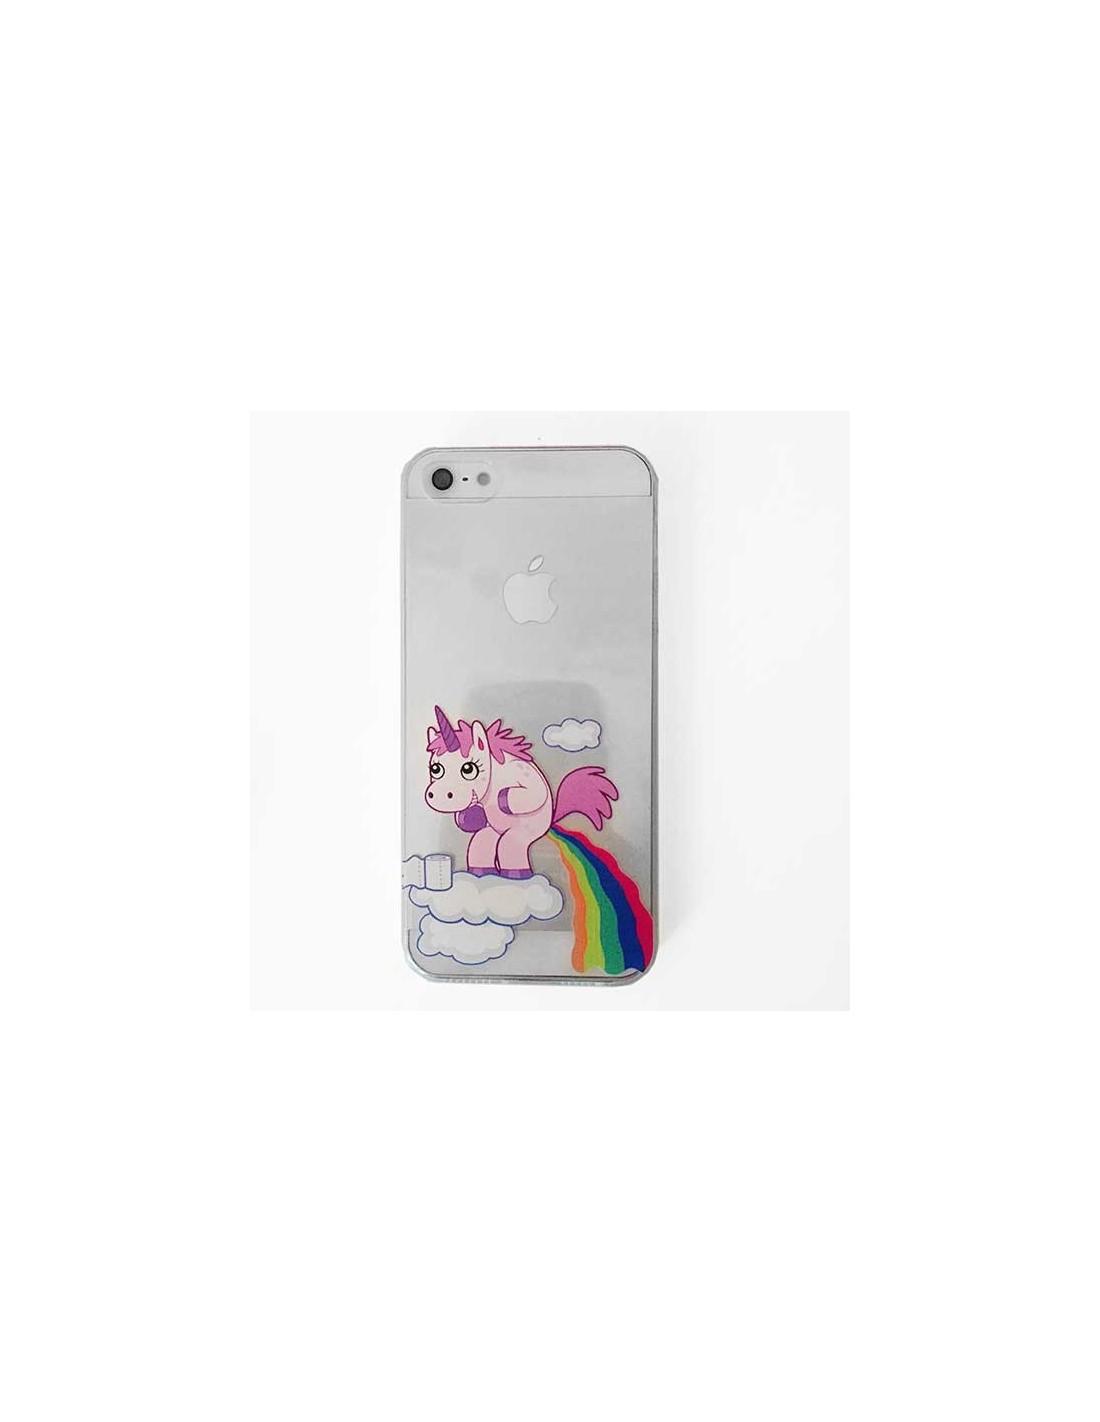 coque iphone 5 5s se licorne caca arc en ciel transparente en silicone semi rigide tpu 5s et se